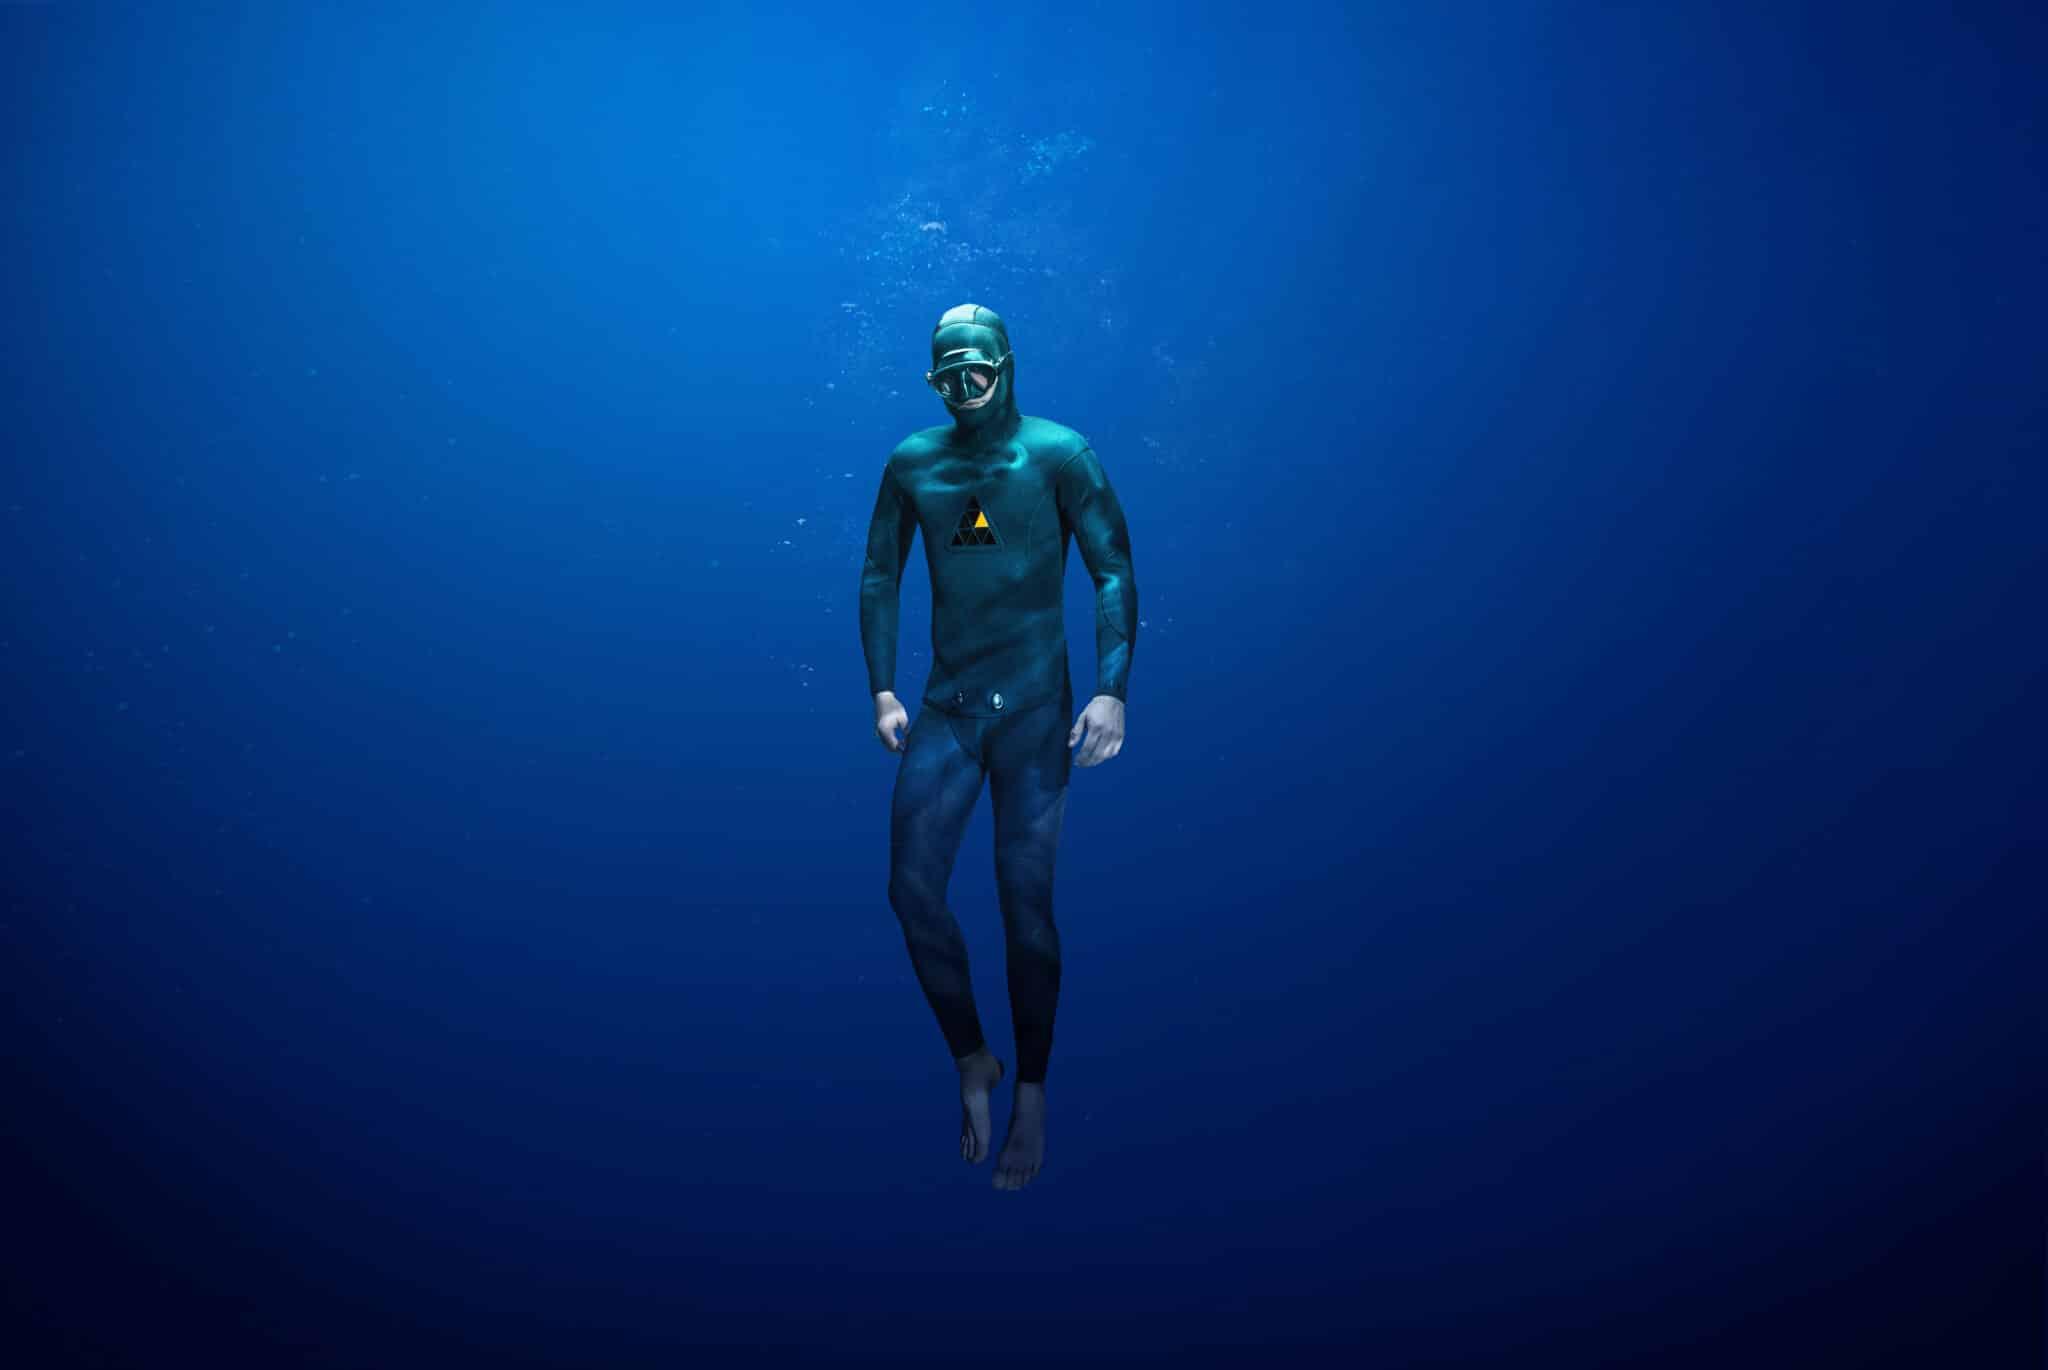 Kiwi Pair Starts Up New Freediving Wetsuit Company